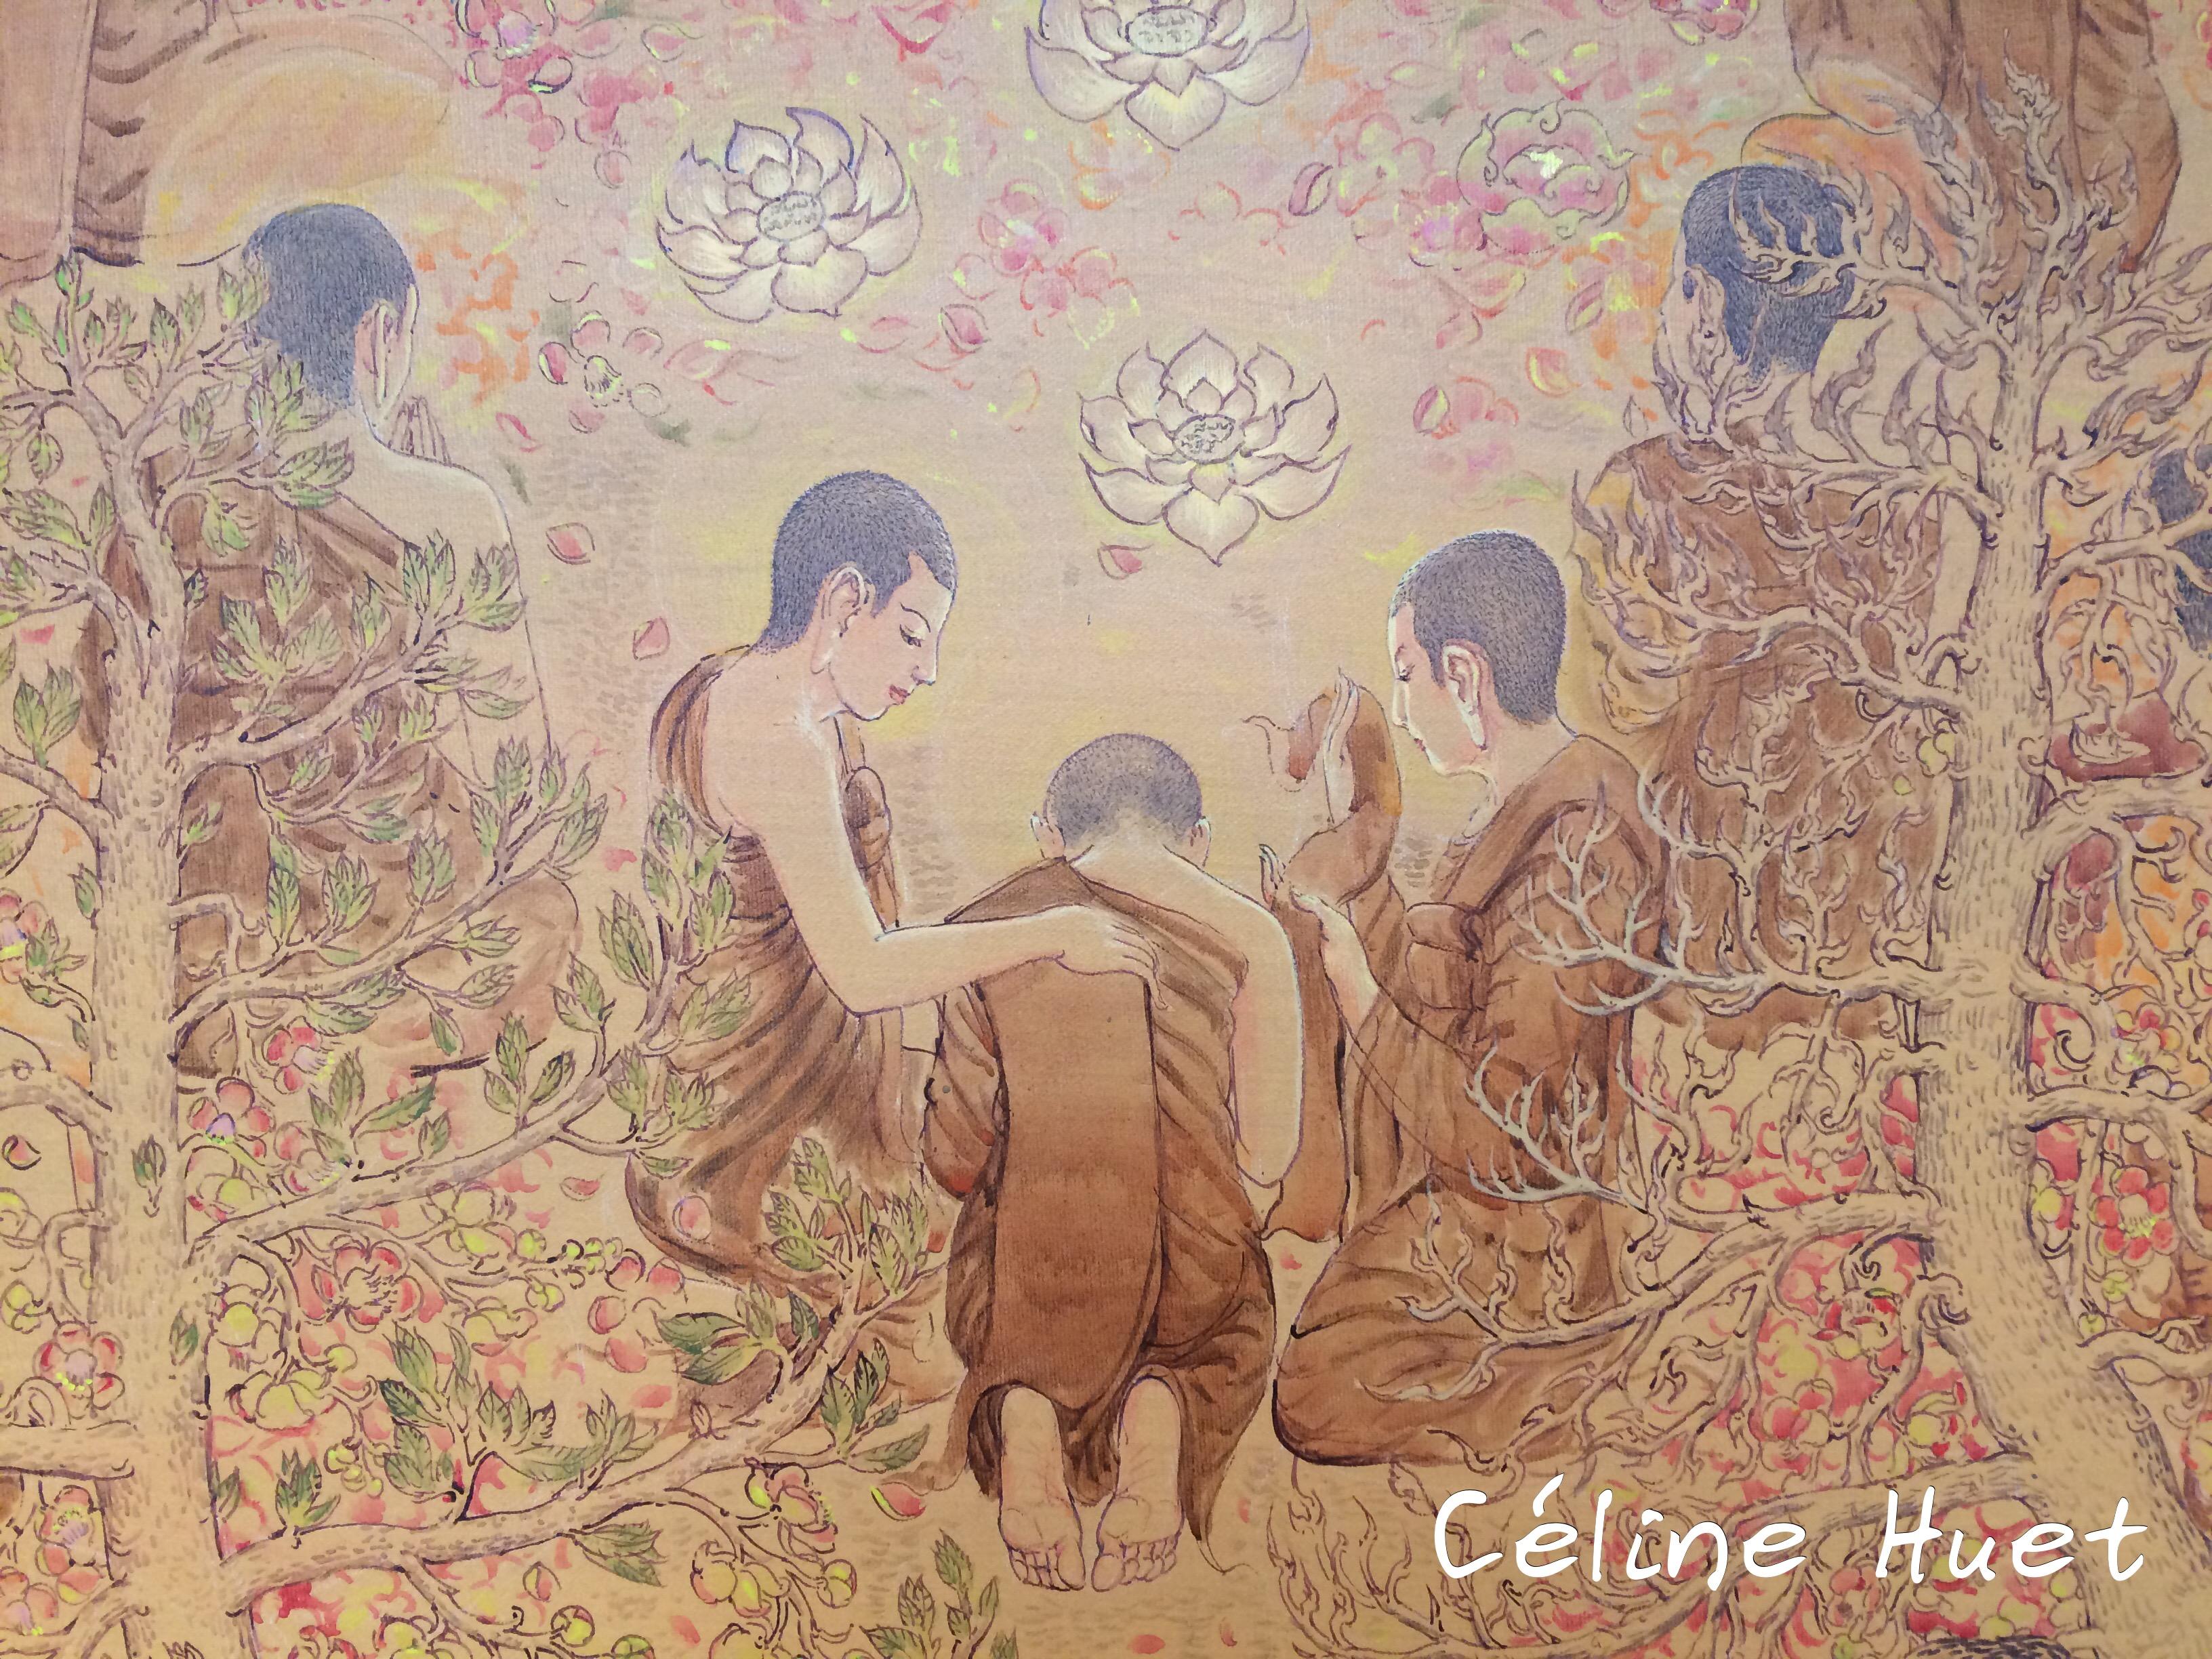 Buddhism Destination 3 (Death) Chatchawan Rodklongtan MOCA Bangkok Thaïlande Asie